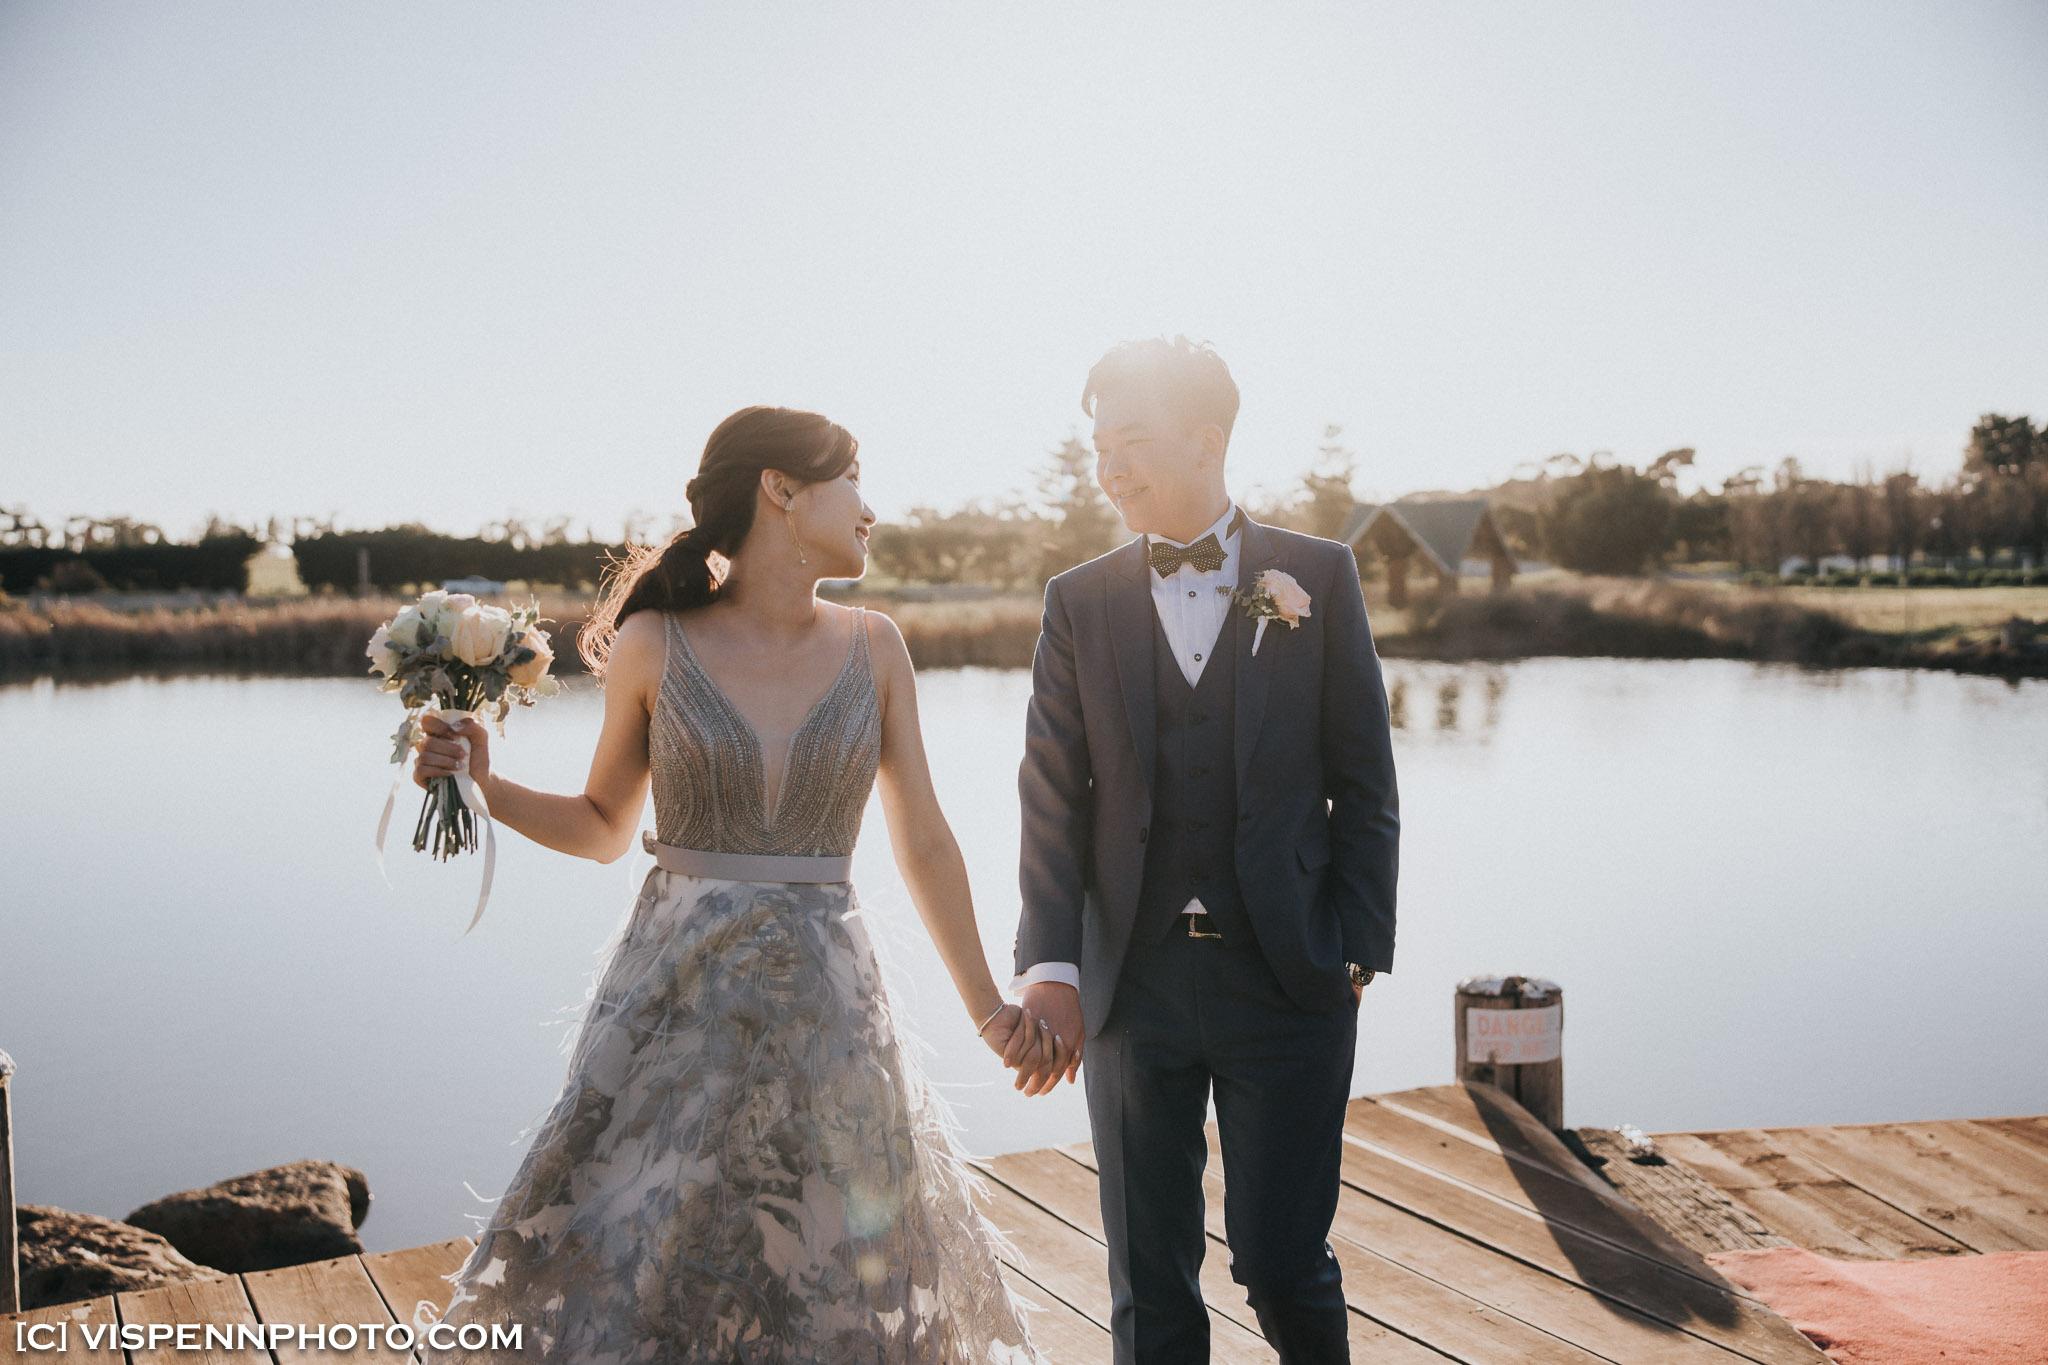 WEDDING DAY Photography Melbourne VISPENN 墨尔本 婚礼跟拍 婚礼摄像 婚礼摄影 结婚照 登记照 AndyIcyWED 9753 EOSR VISPENN